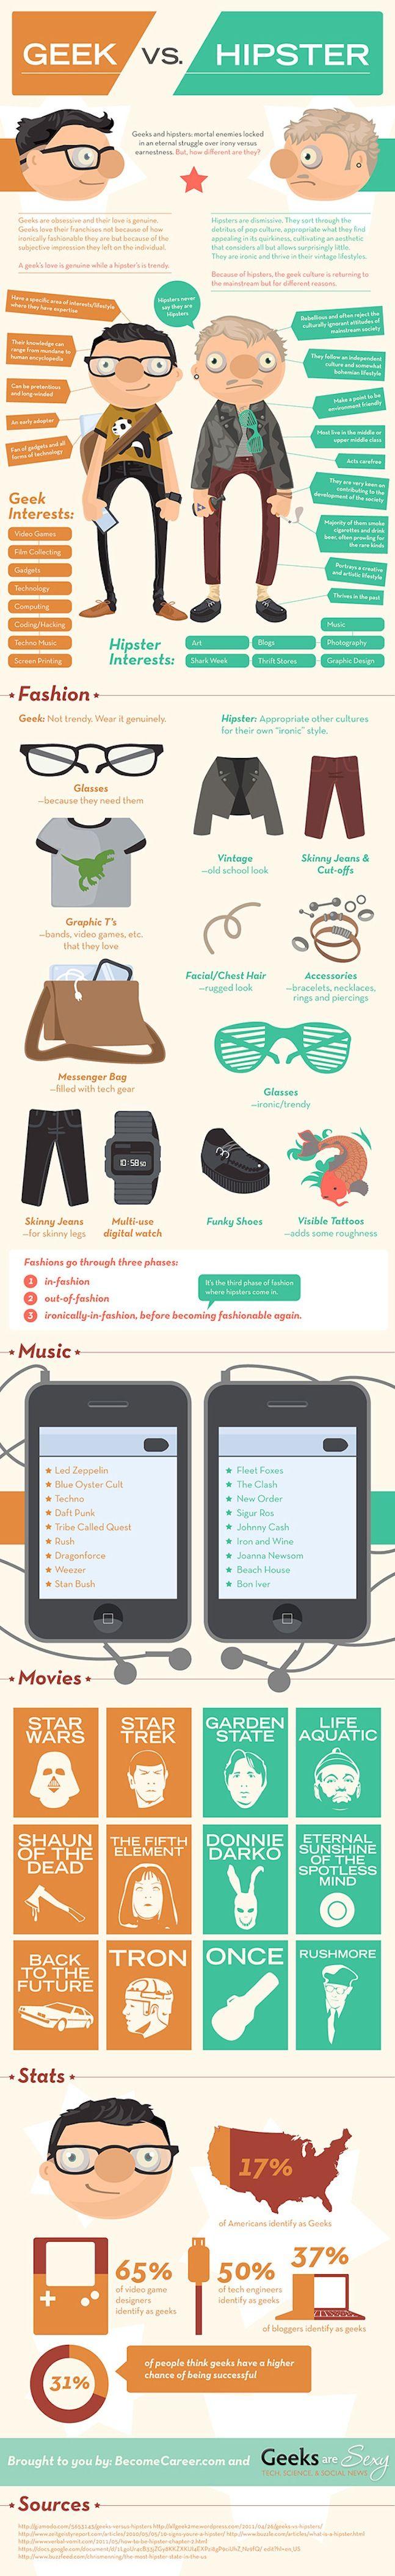 NeraPoesia Web: Ho imparato una parola nuova: hipster hipsters vs geek